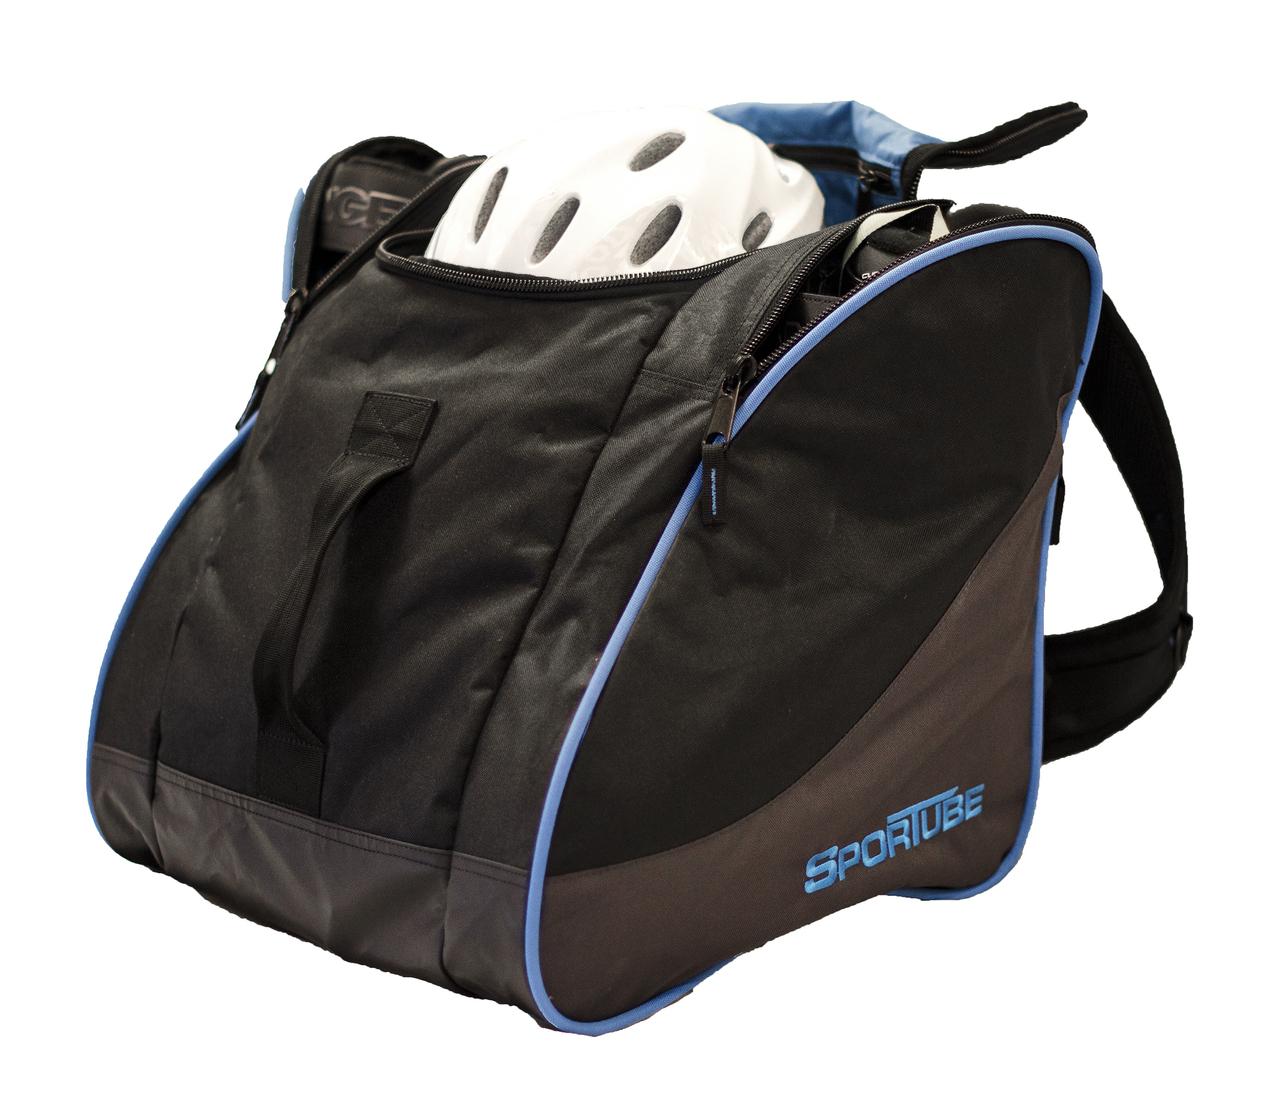 Traveler Ski Boot Bag and Backpack   SporTube - StoreYourBoard.com baf9b886fc